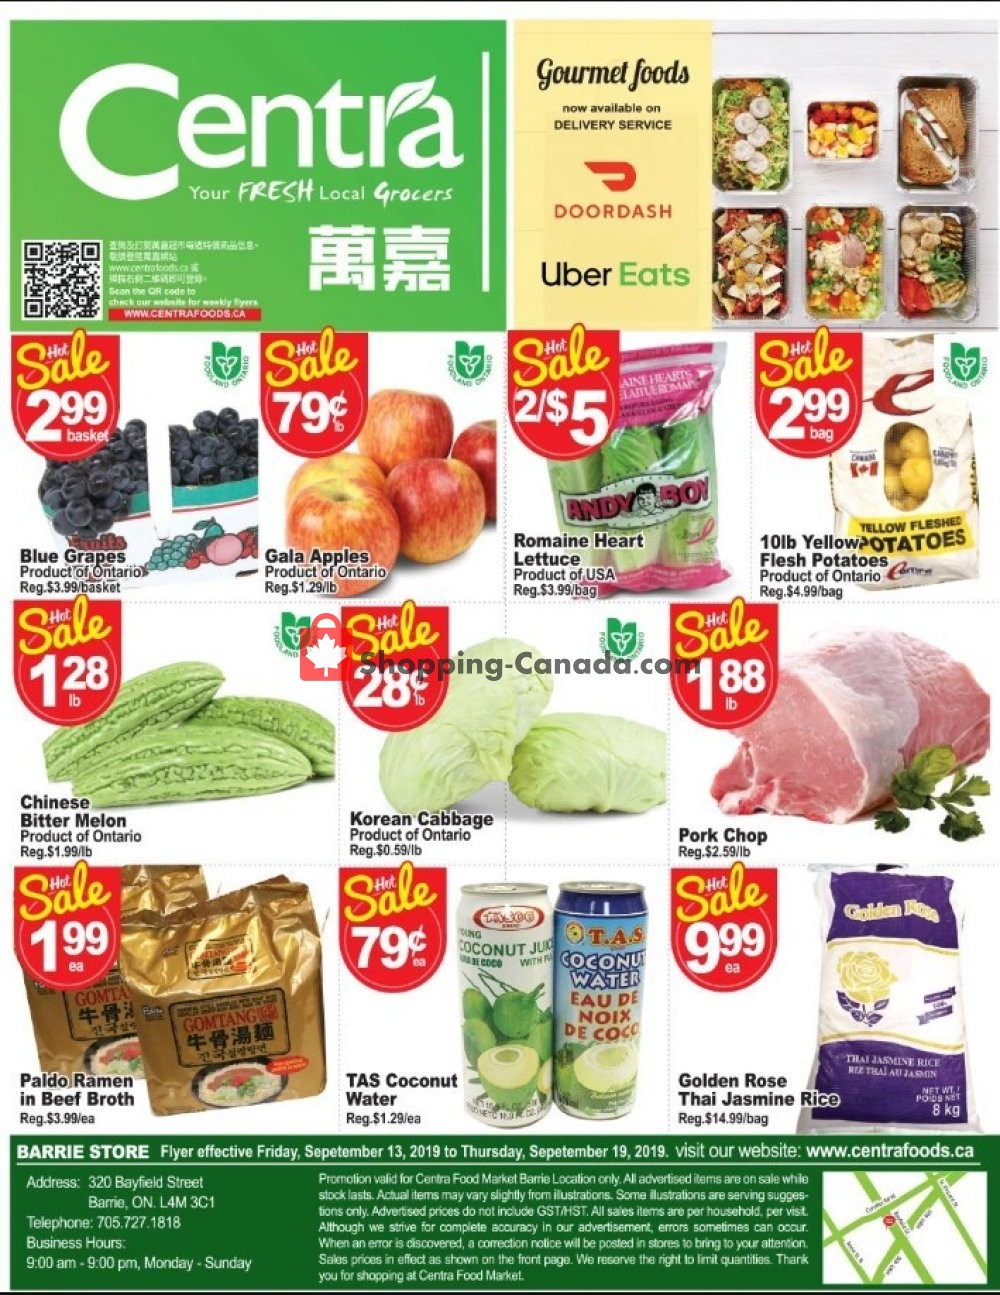 Flyer Centra Food Market Canada - from Friday September 13, 2019 to Thursday September 19, 2019